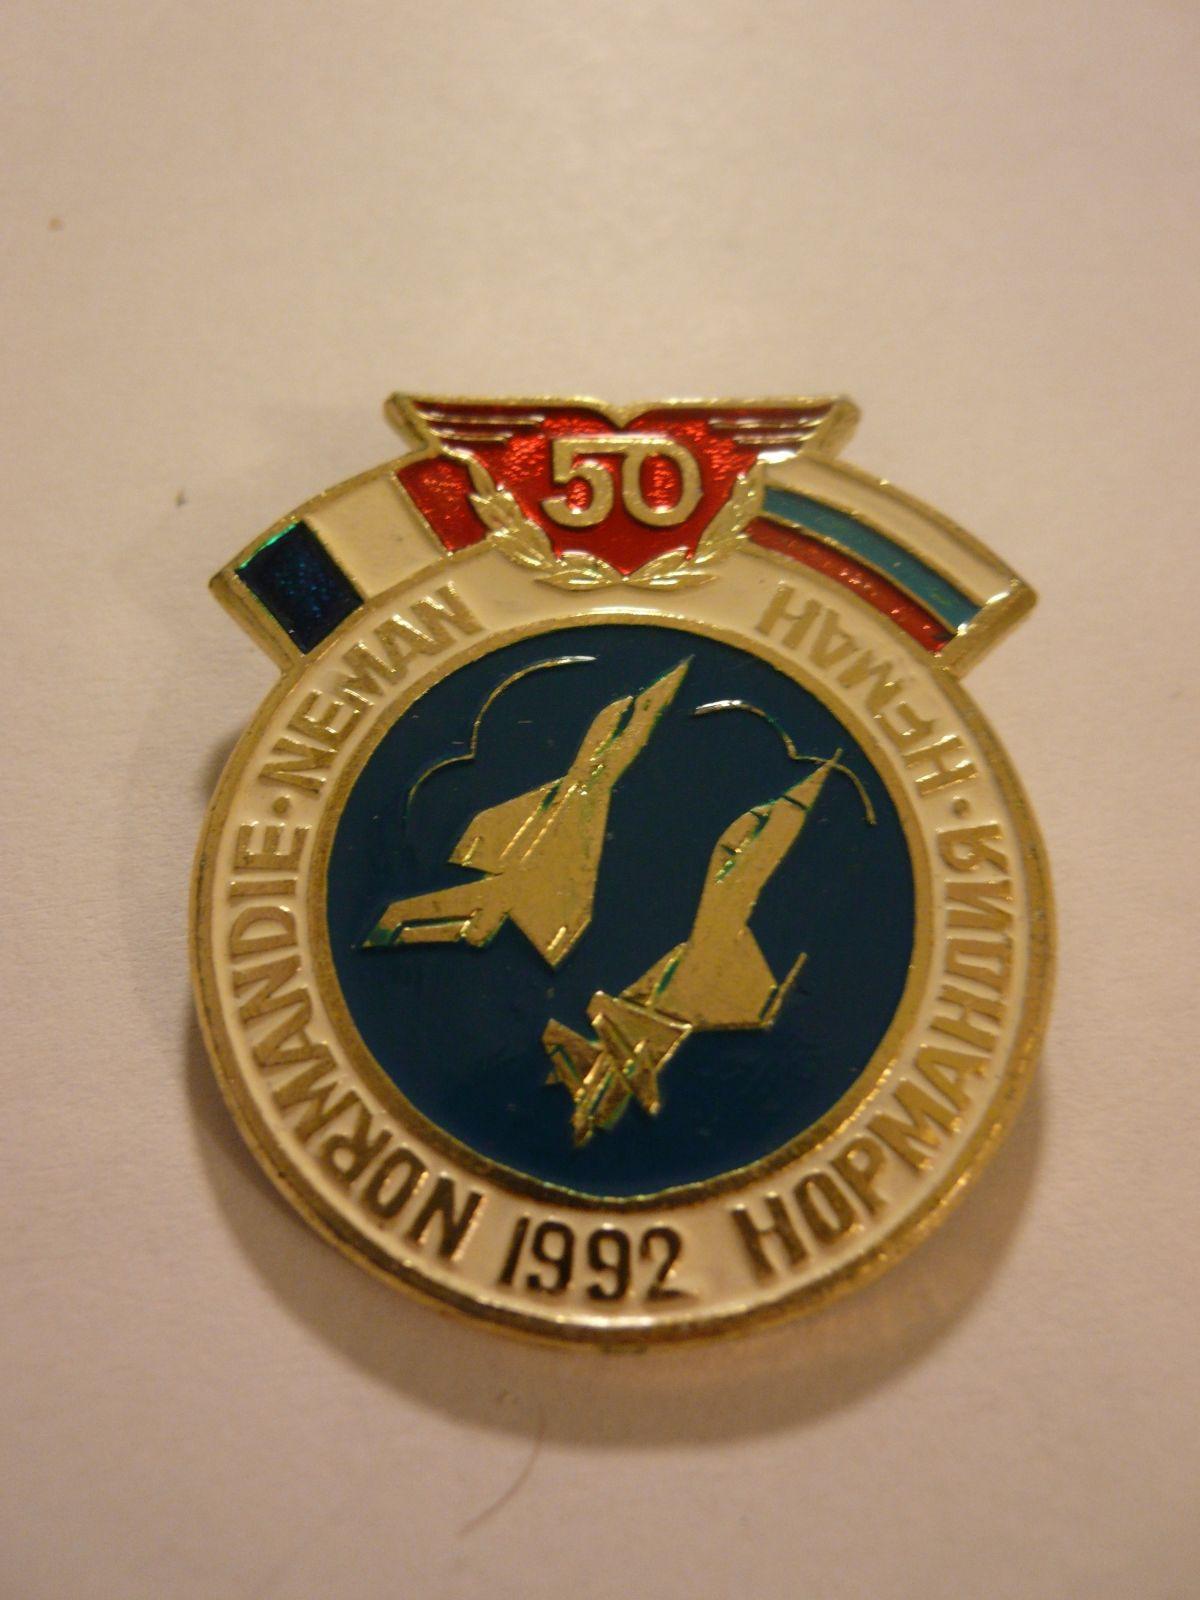 50 let vojů v Normandii, Rusko